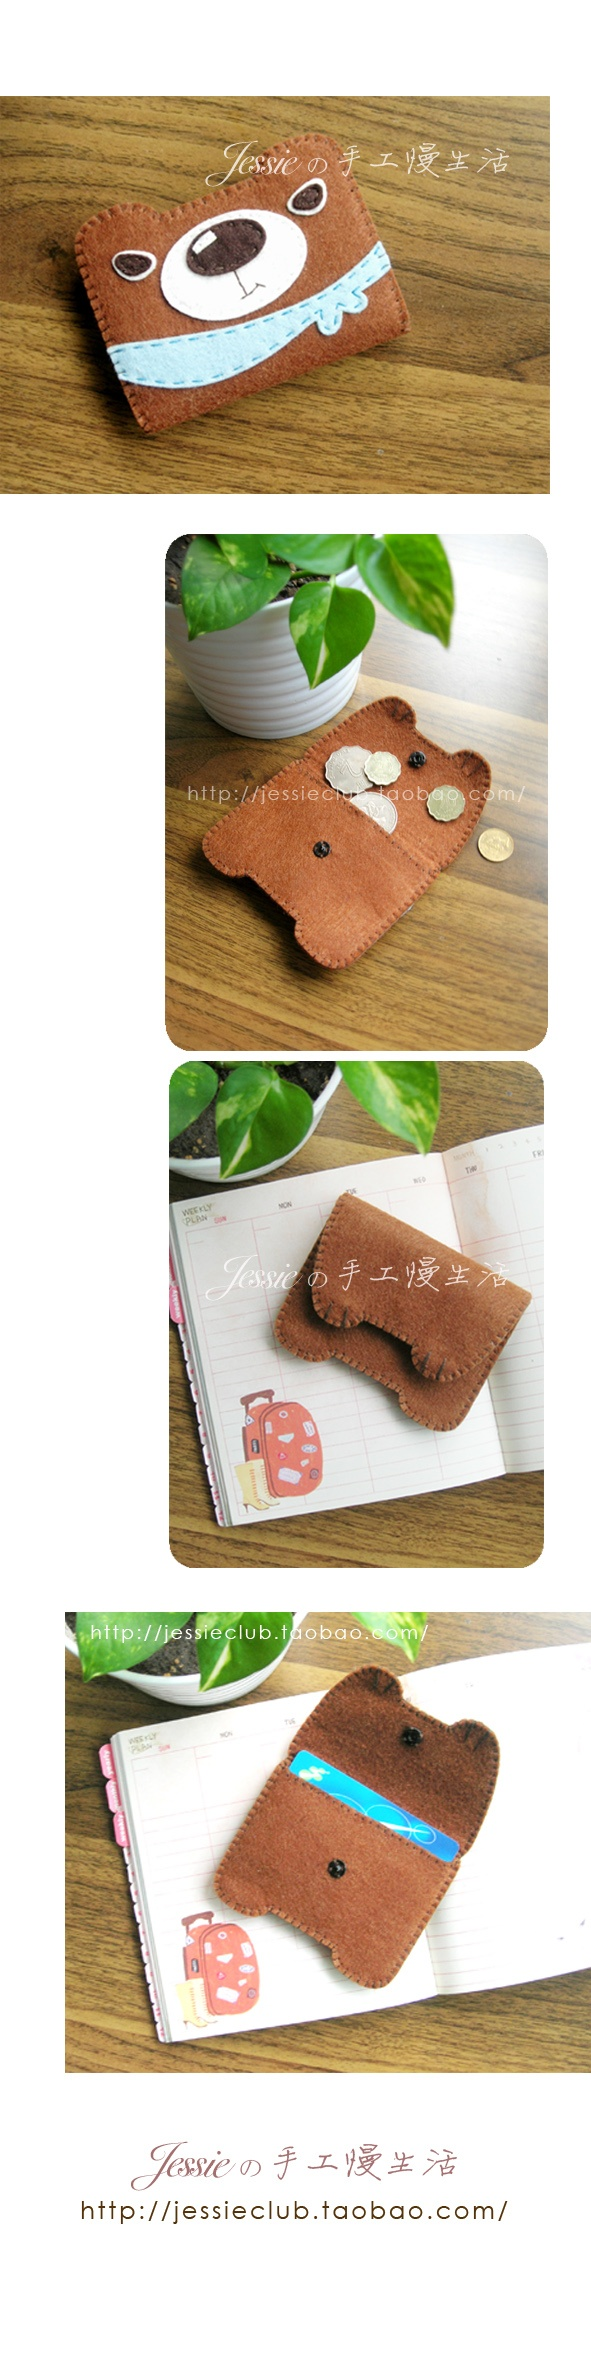 Monedero de fieltro con forma de oso estilo kawaii